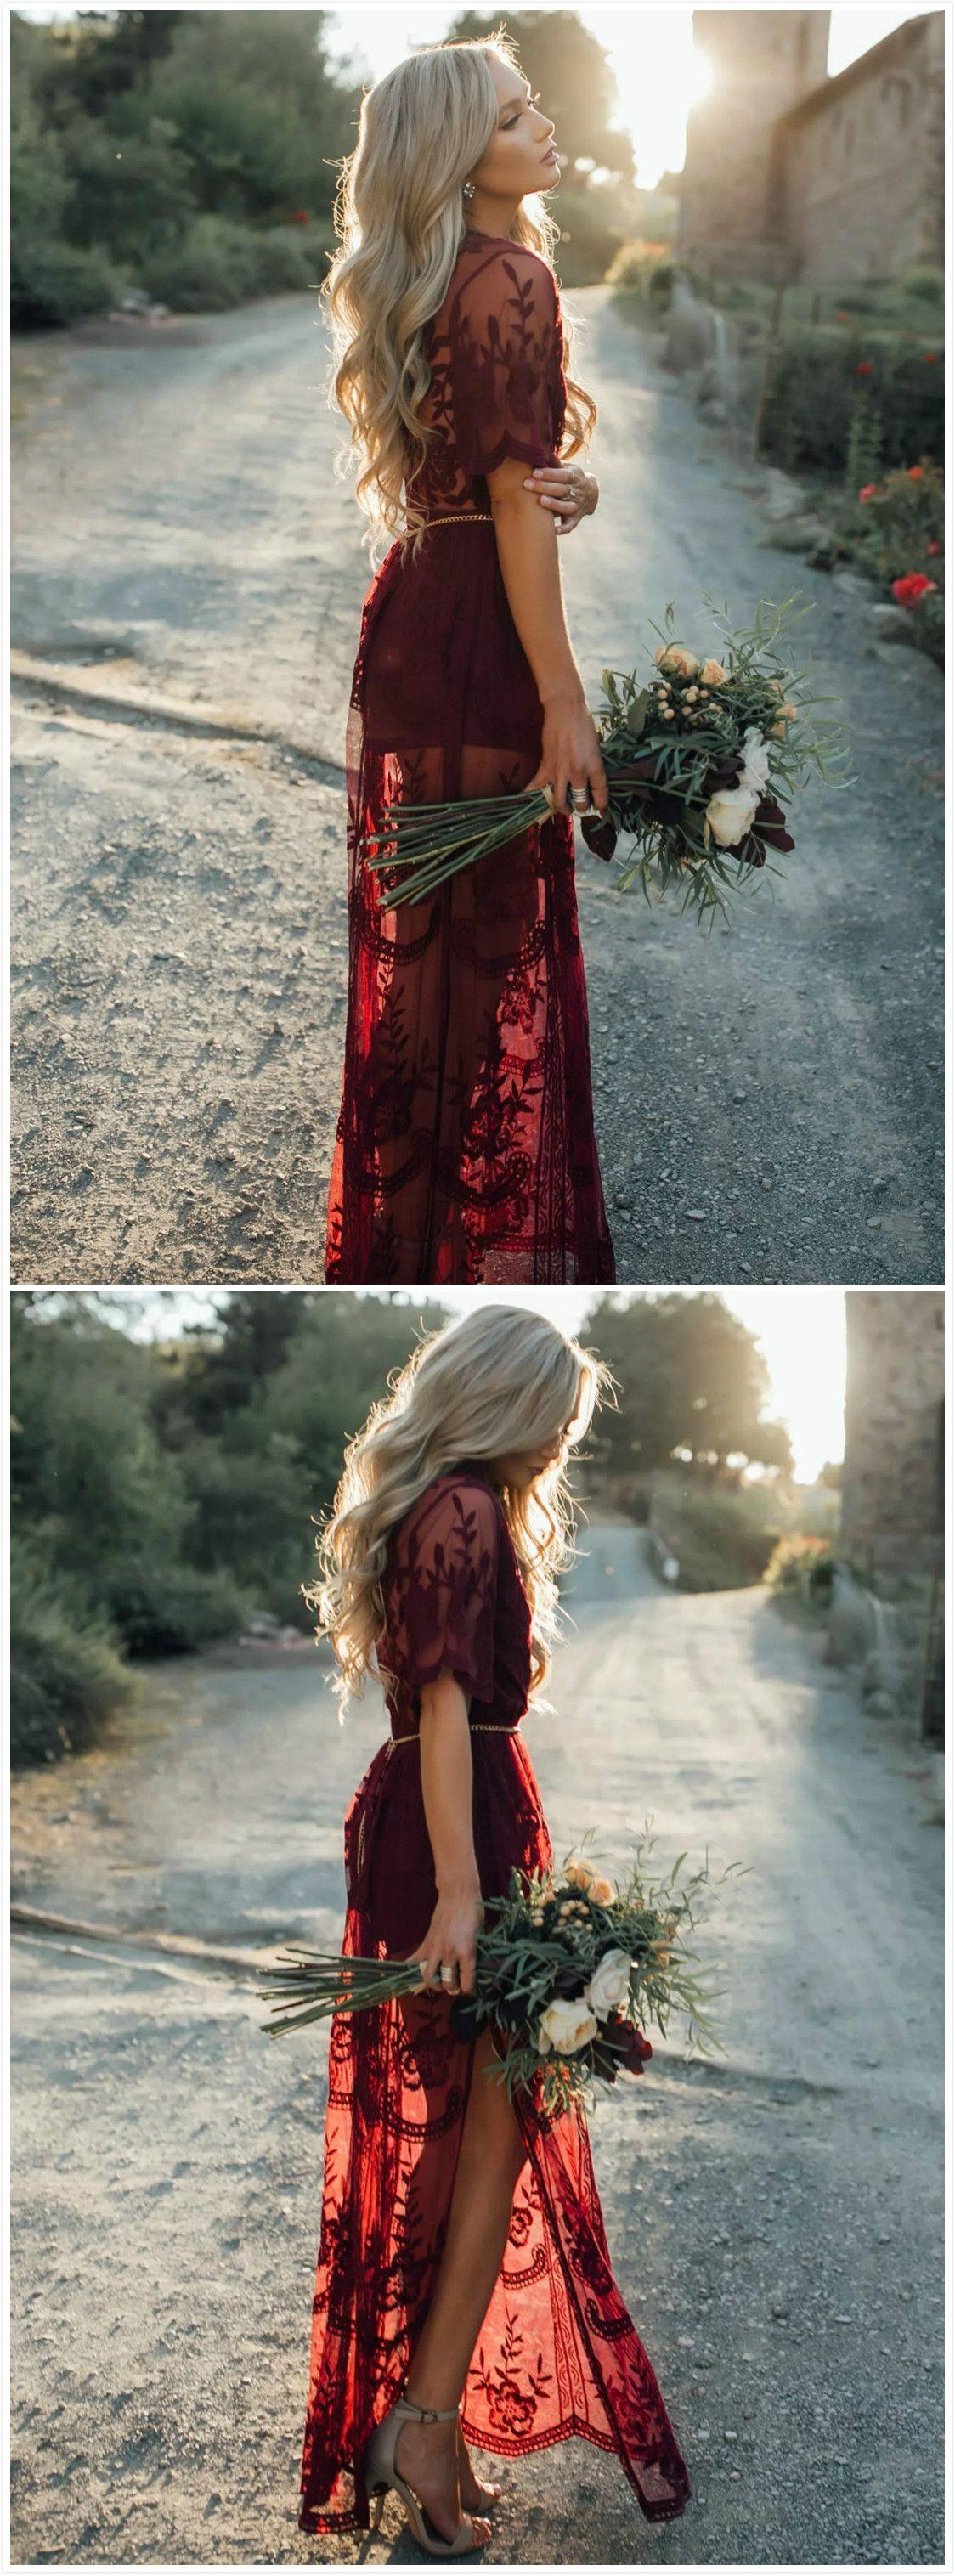 Womenus deep v neck short sleeve high waist lace prom dress hair